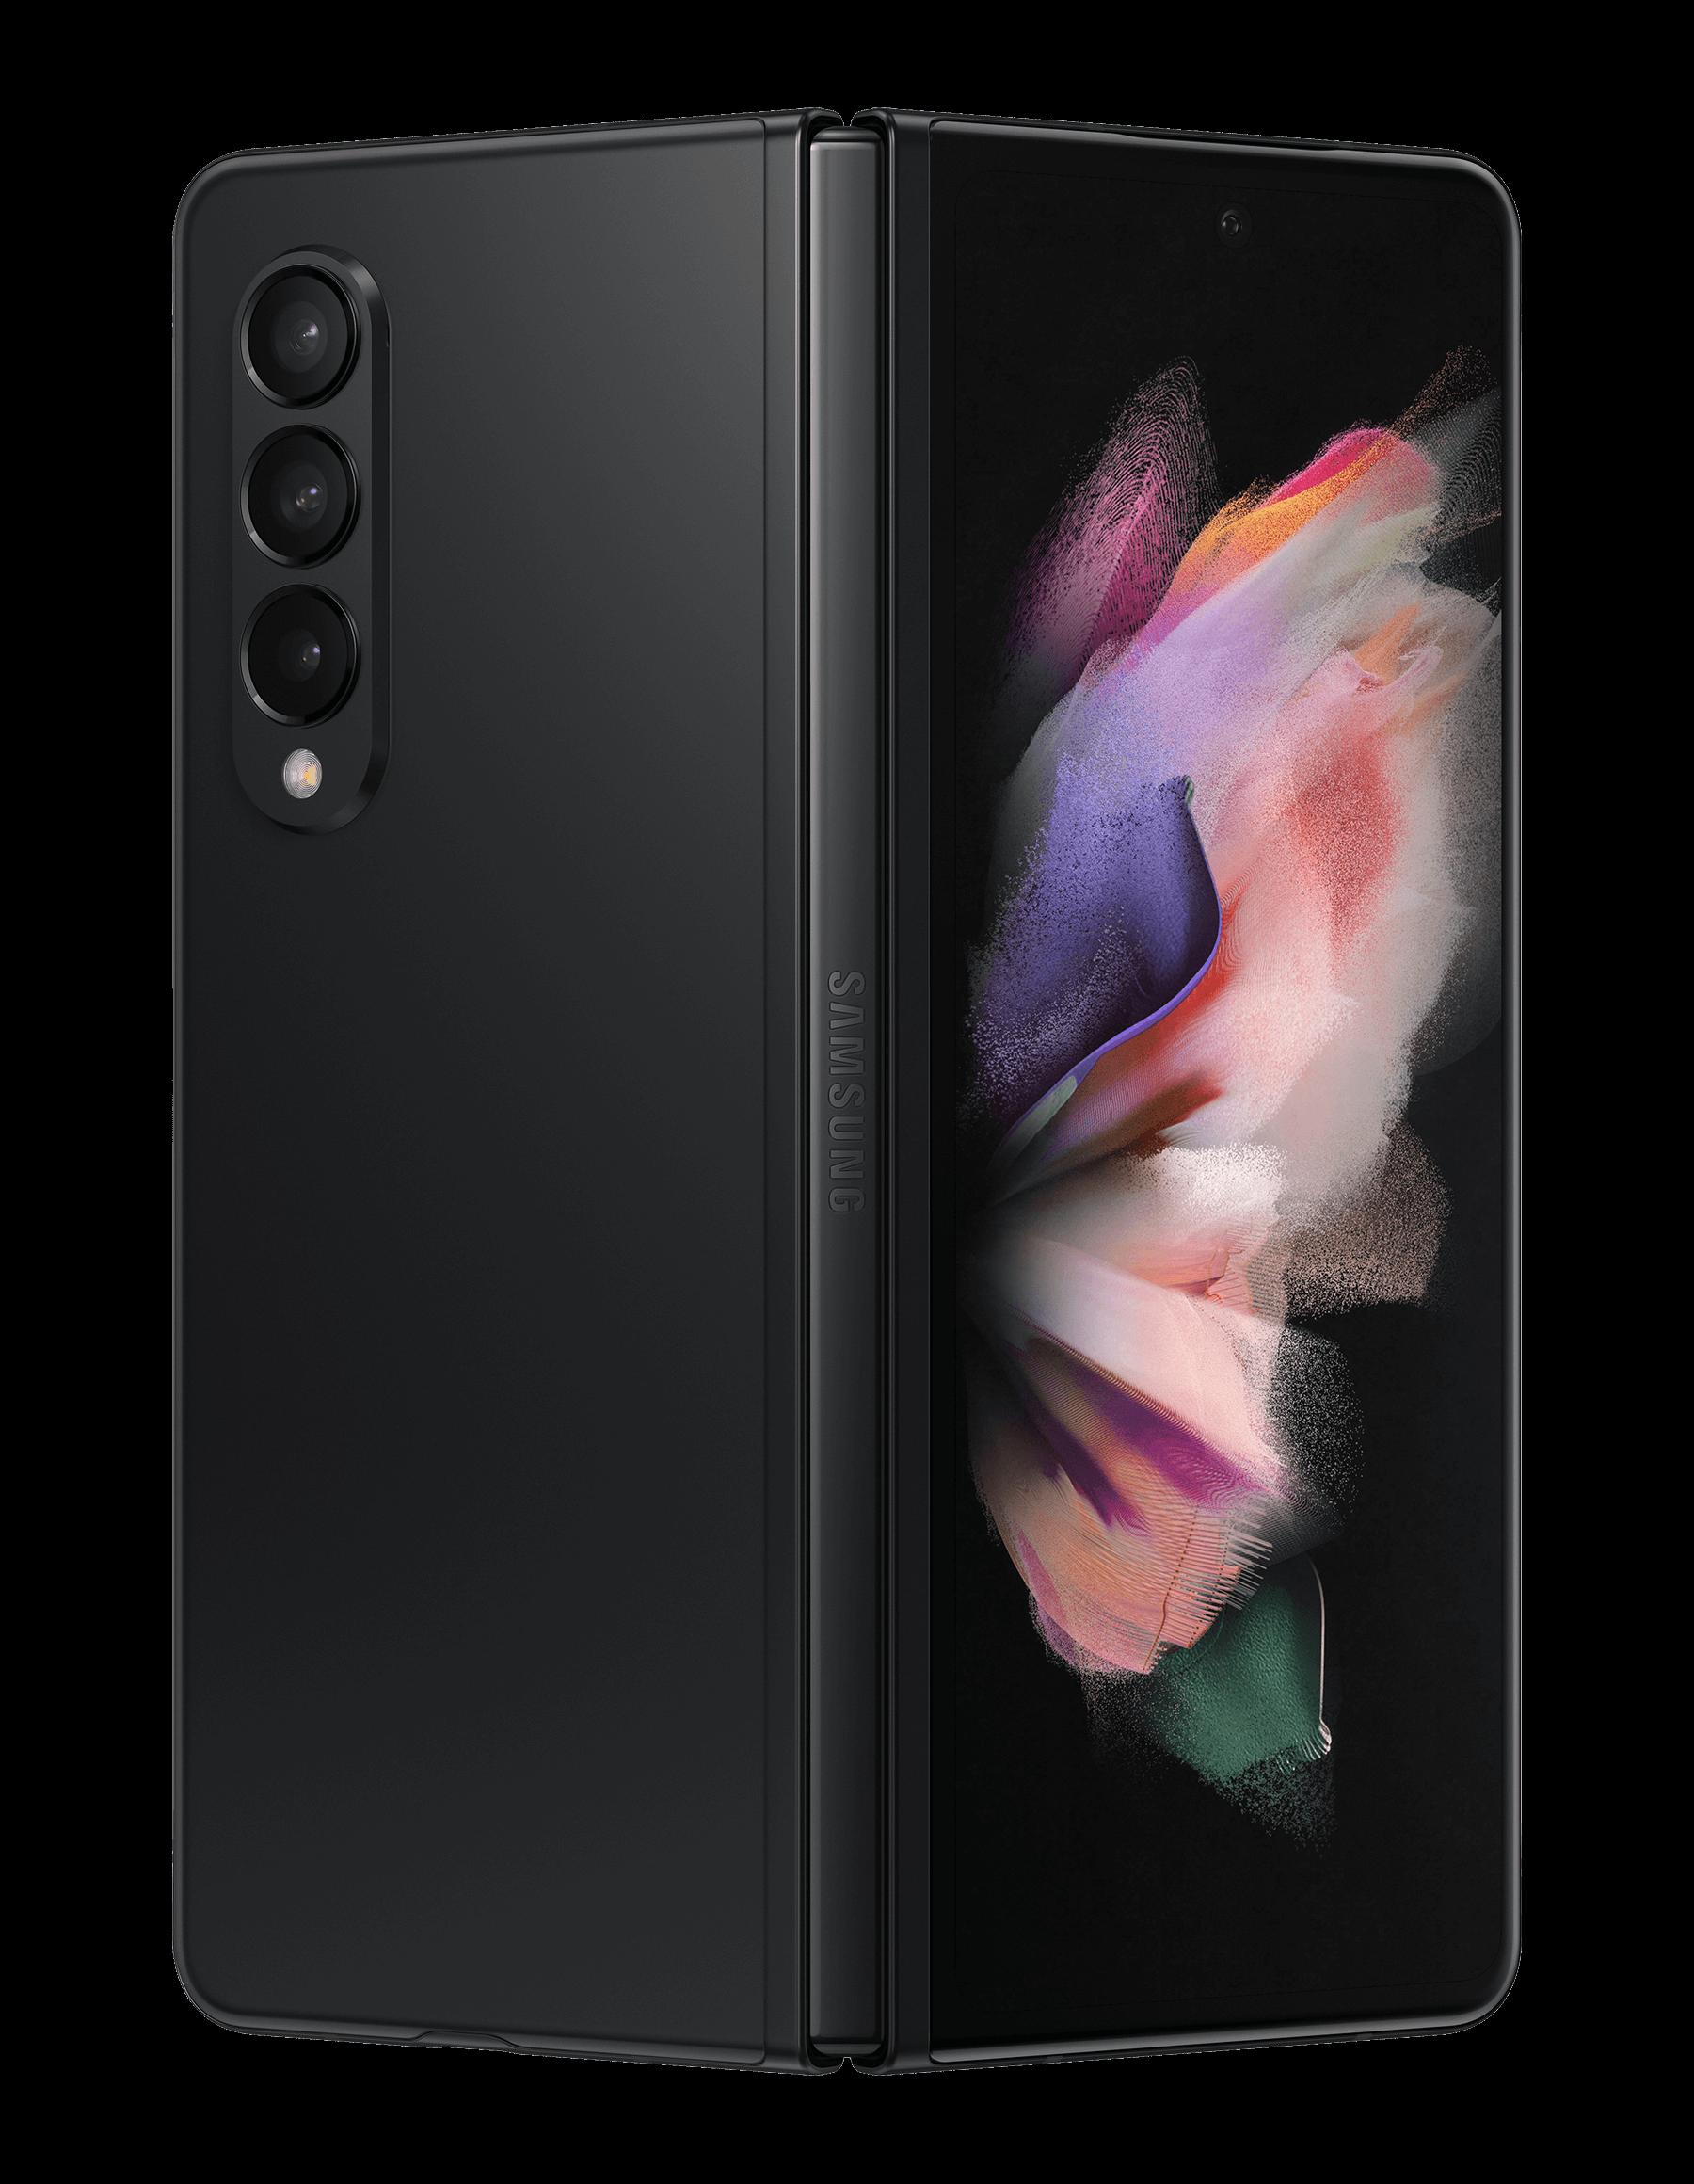 Galaxy Z Fold 3, Samsung Galaxy Z Fold 3 – Fiche technique, test et prix